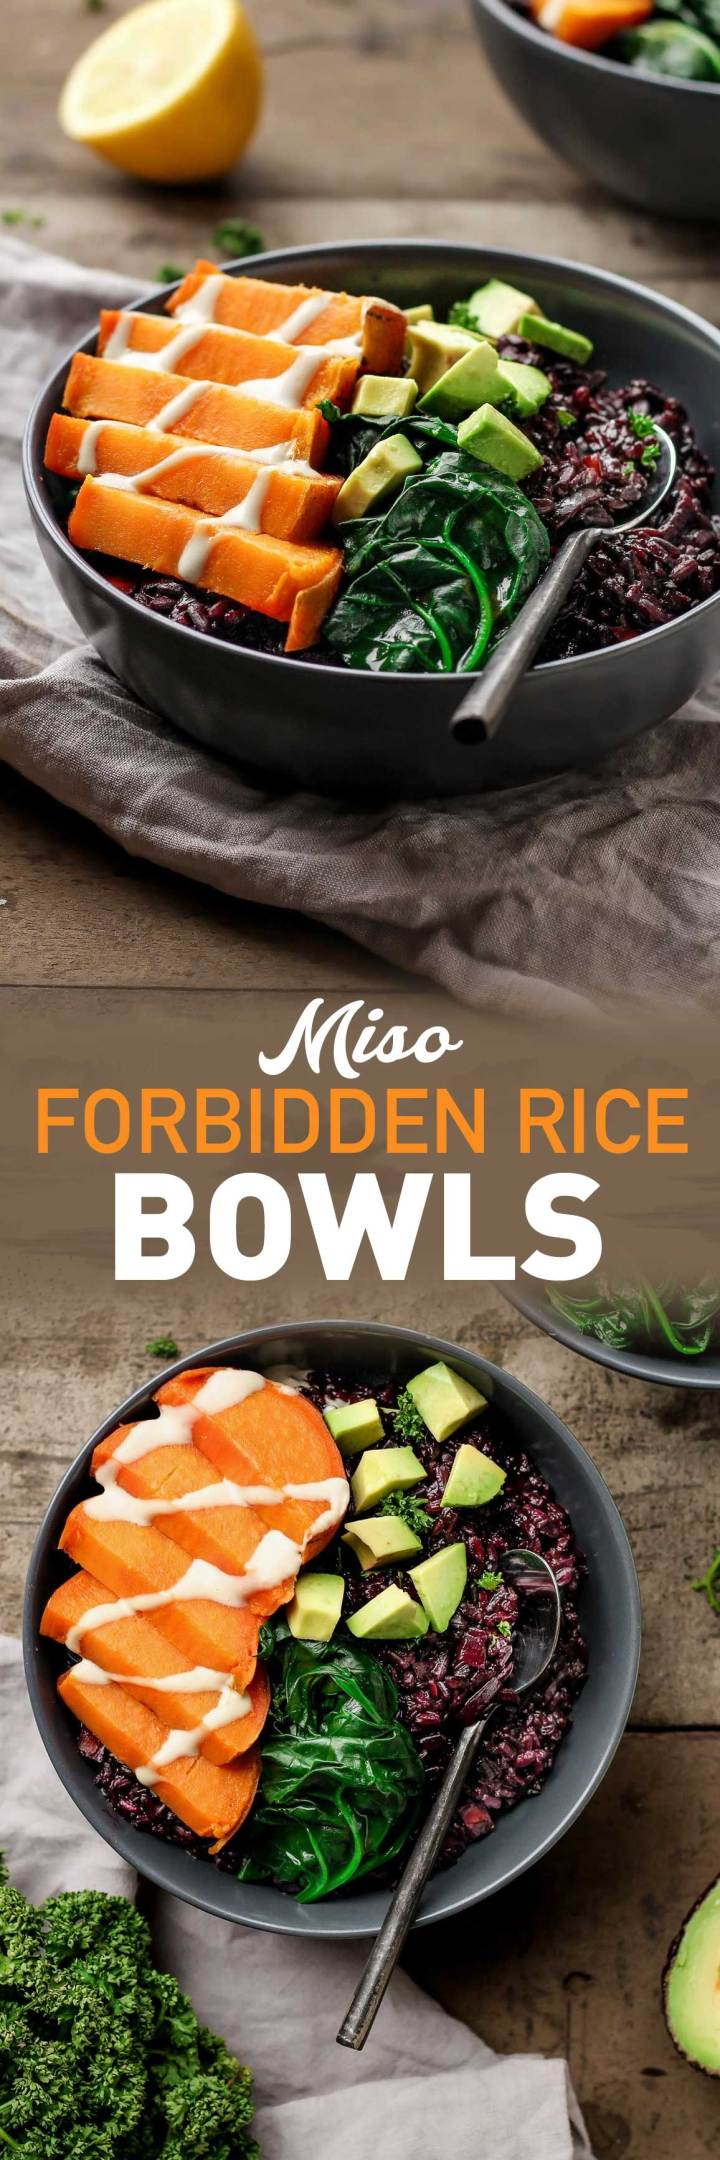 Miso Forbidden Rice Bowls